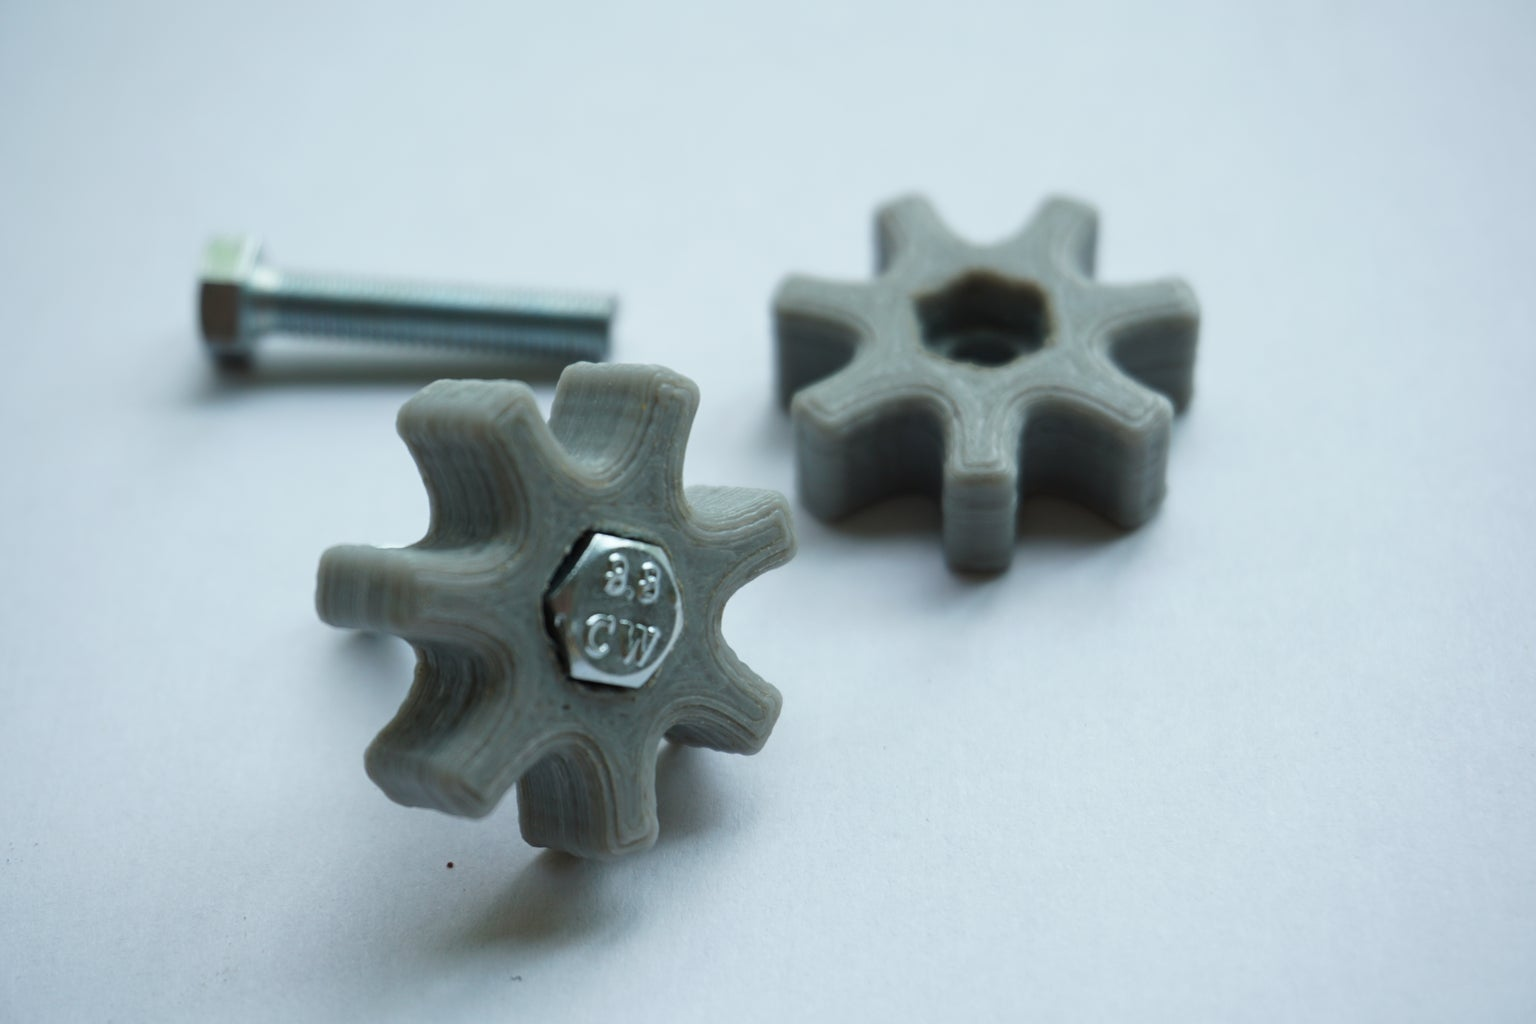 3D Printed Screw Aid